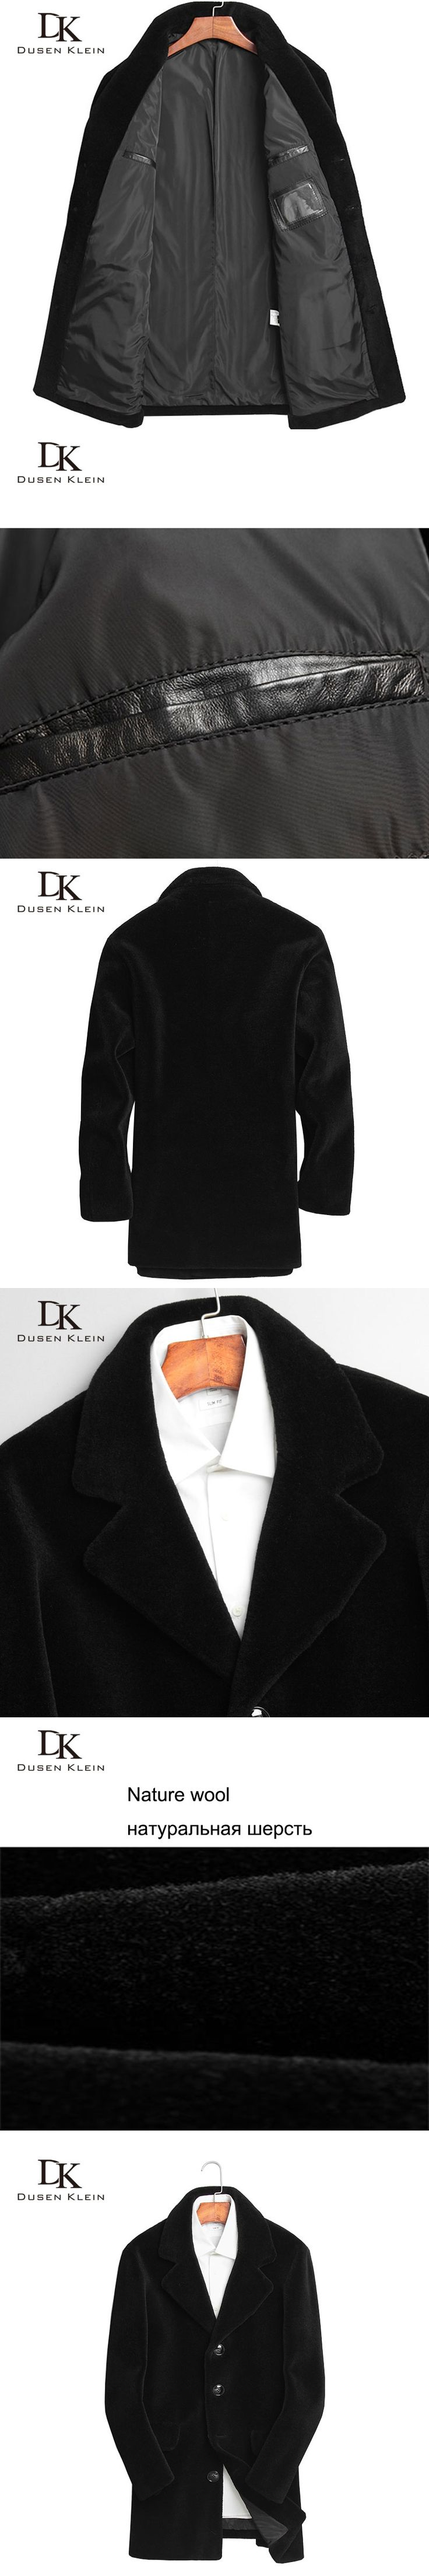 Brand Wool coat men Luxury Dusen Klein Fashion coats for male Long winter Fashion/Slim coat men's Designer outer clothing DK1711